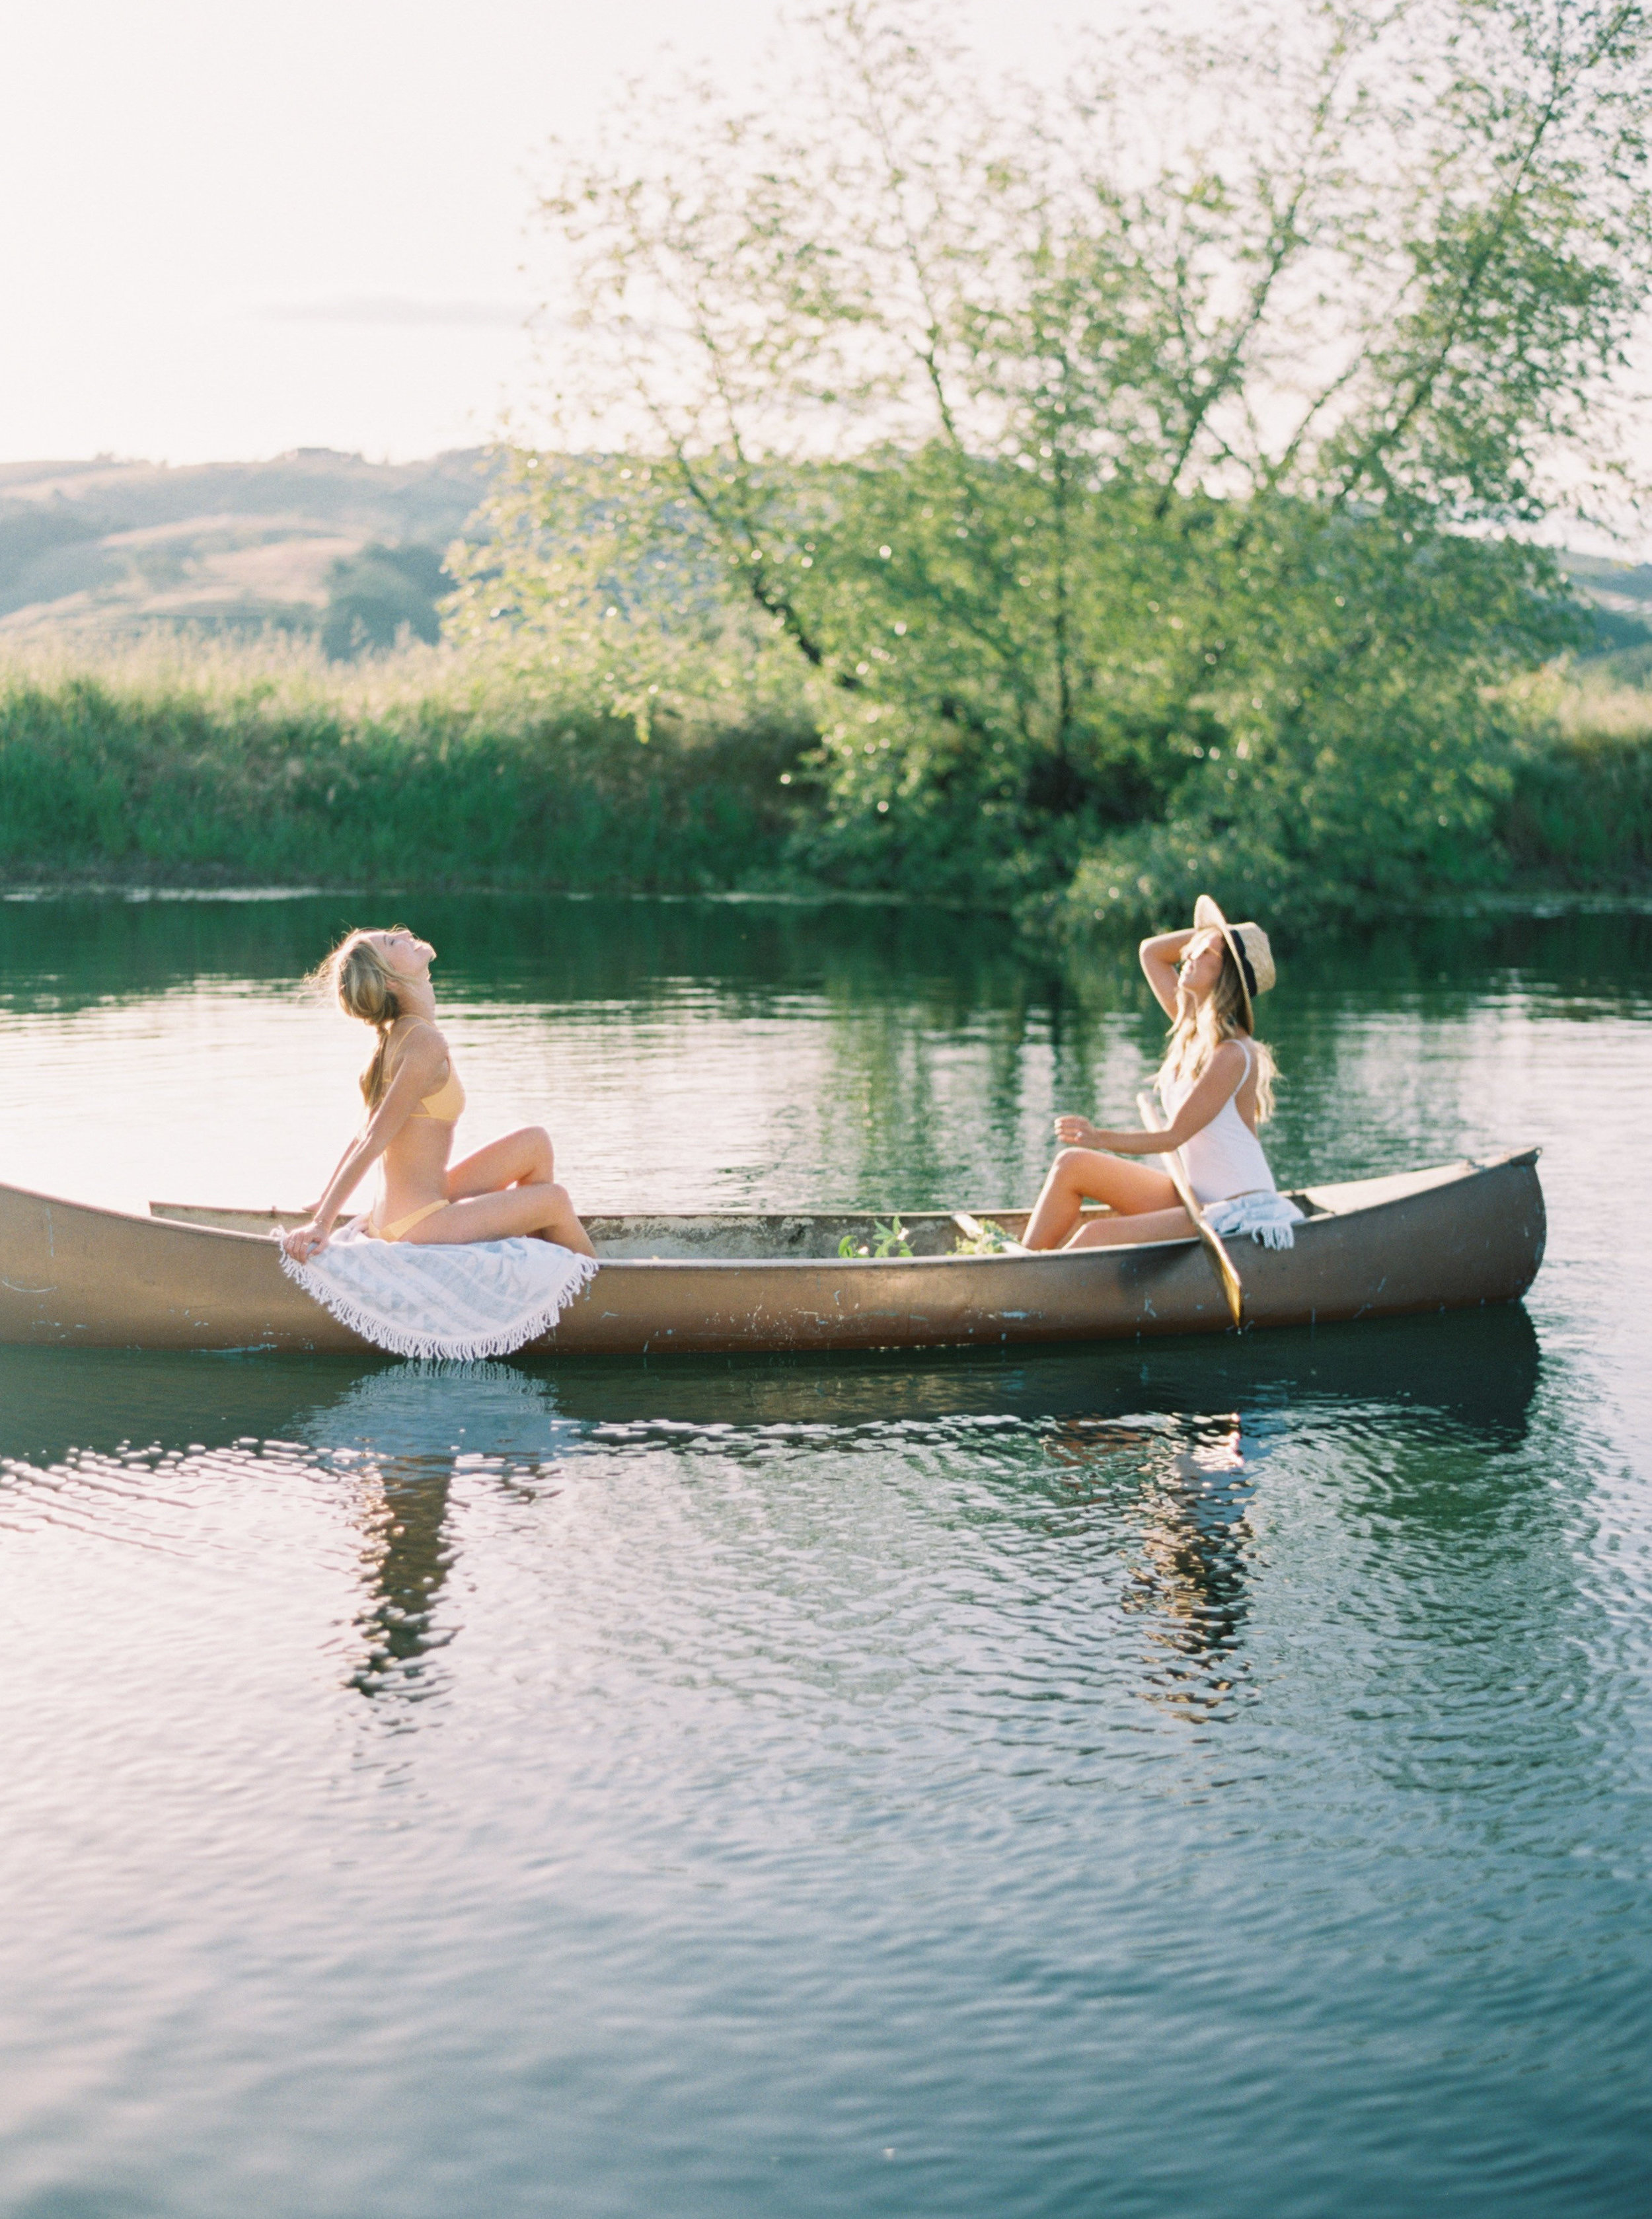 Boats-6.jpg